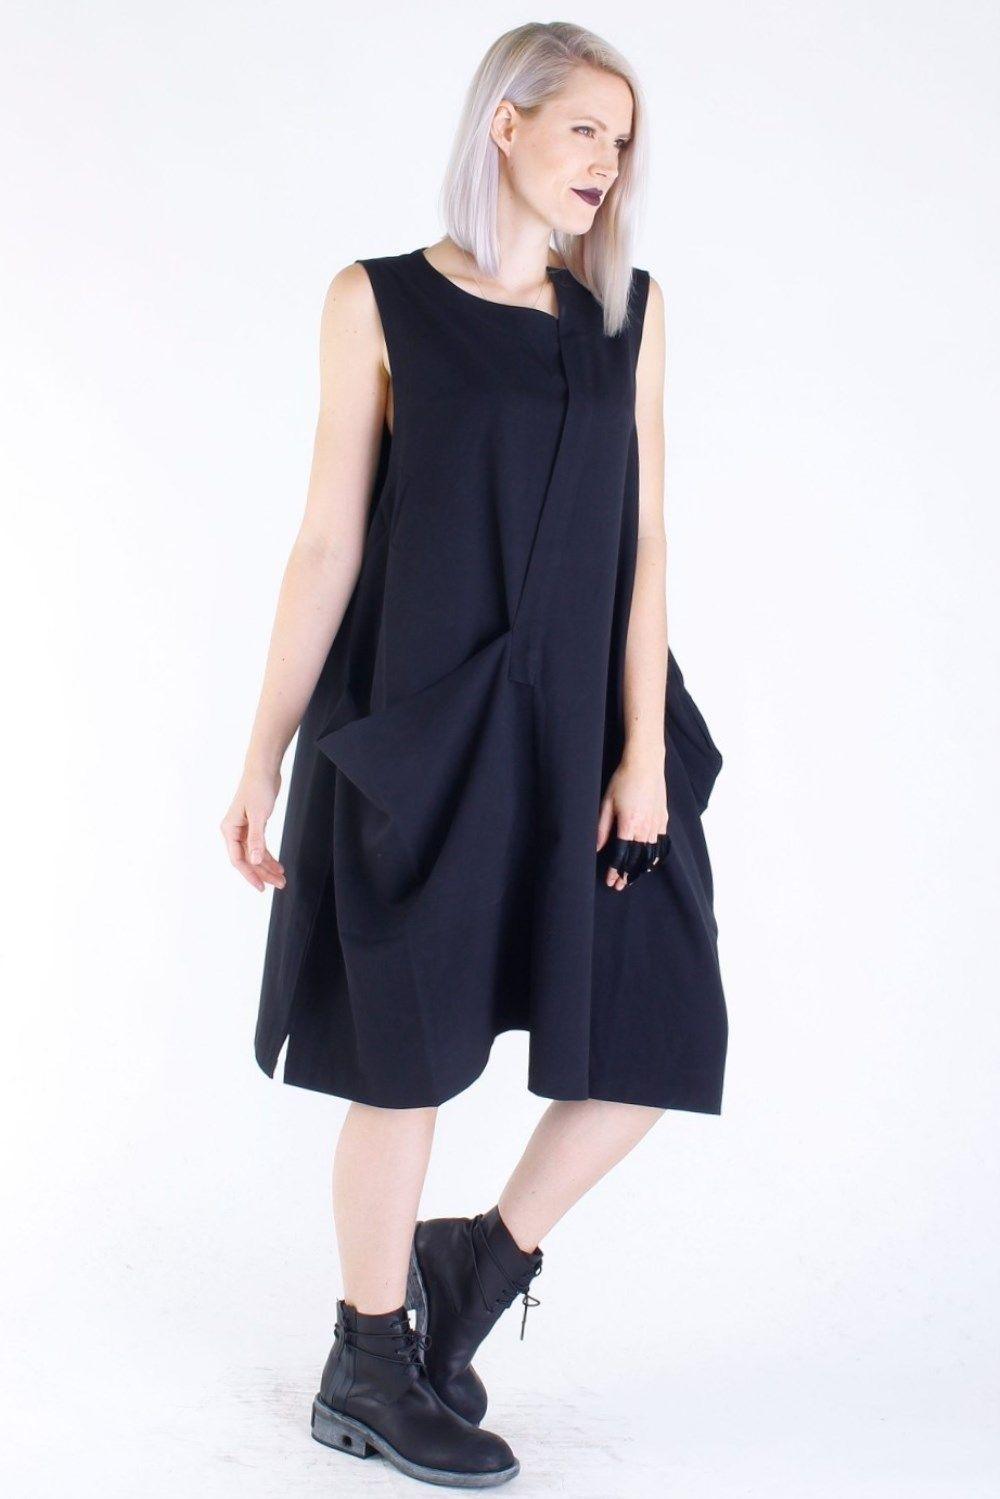 15 Luxurius Kleid Ältere Damen BoutiqueFormal Spektakulär Kleid Ältere Damen Ärmel